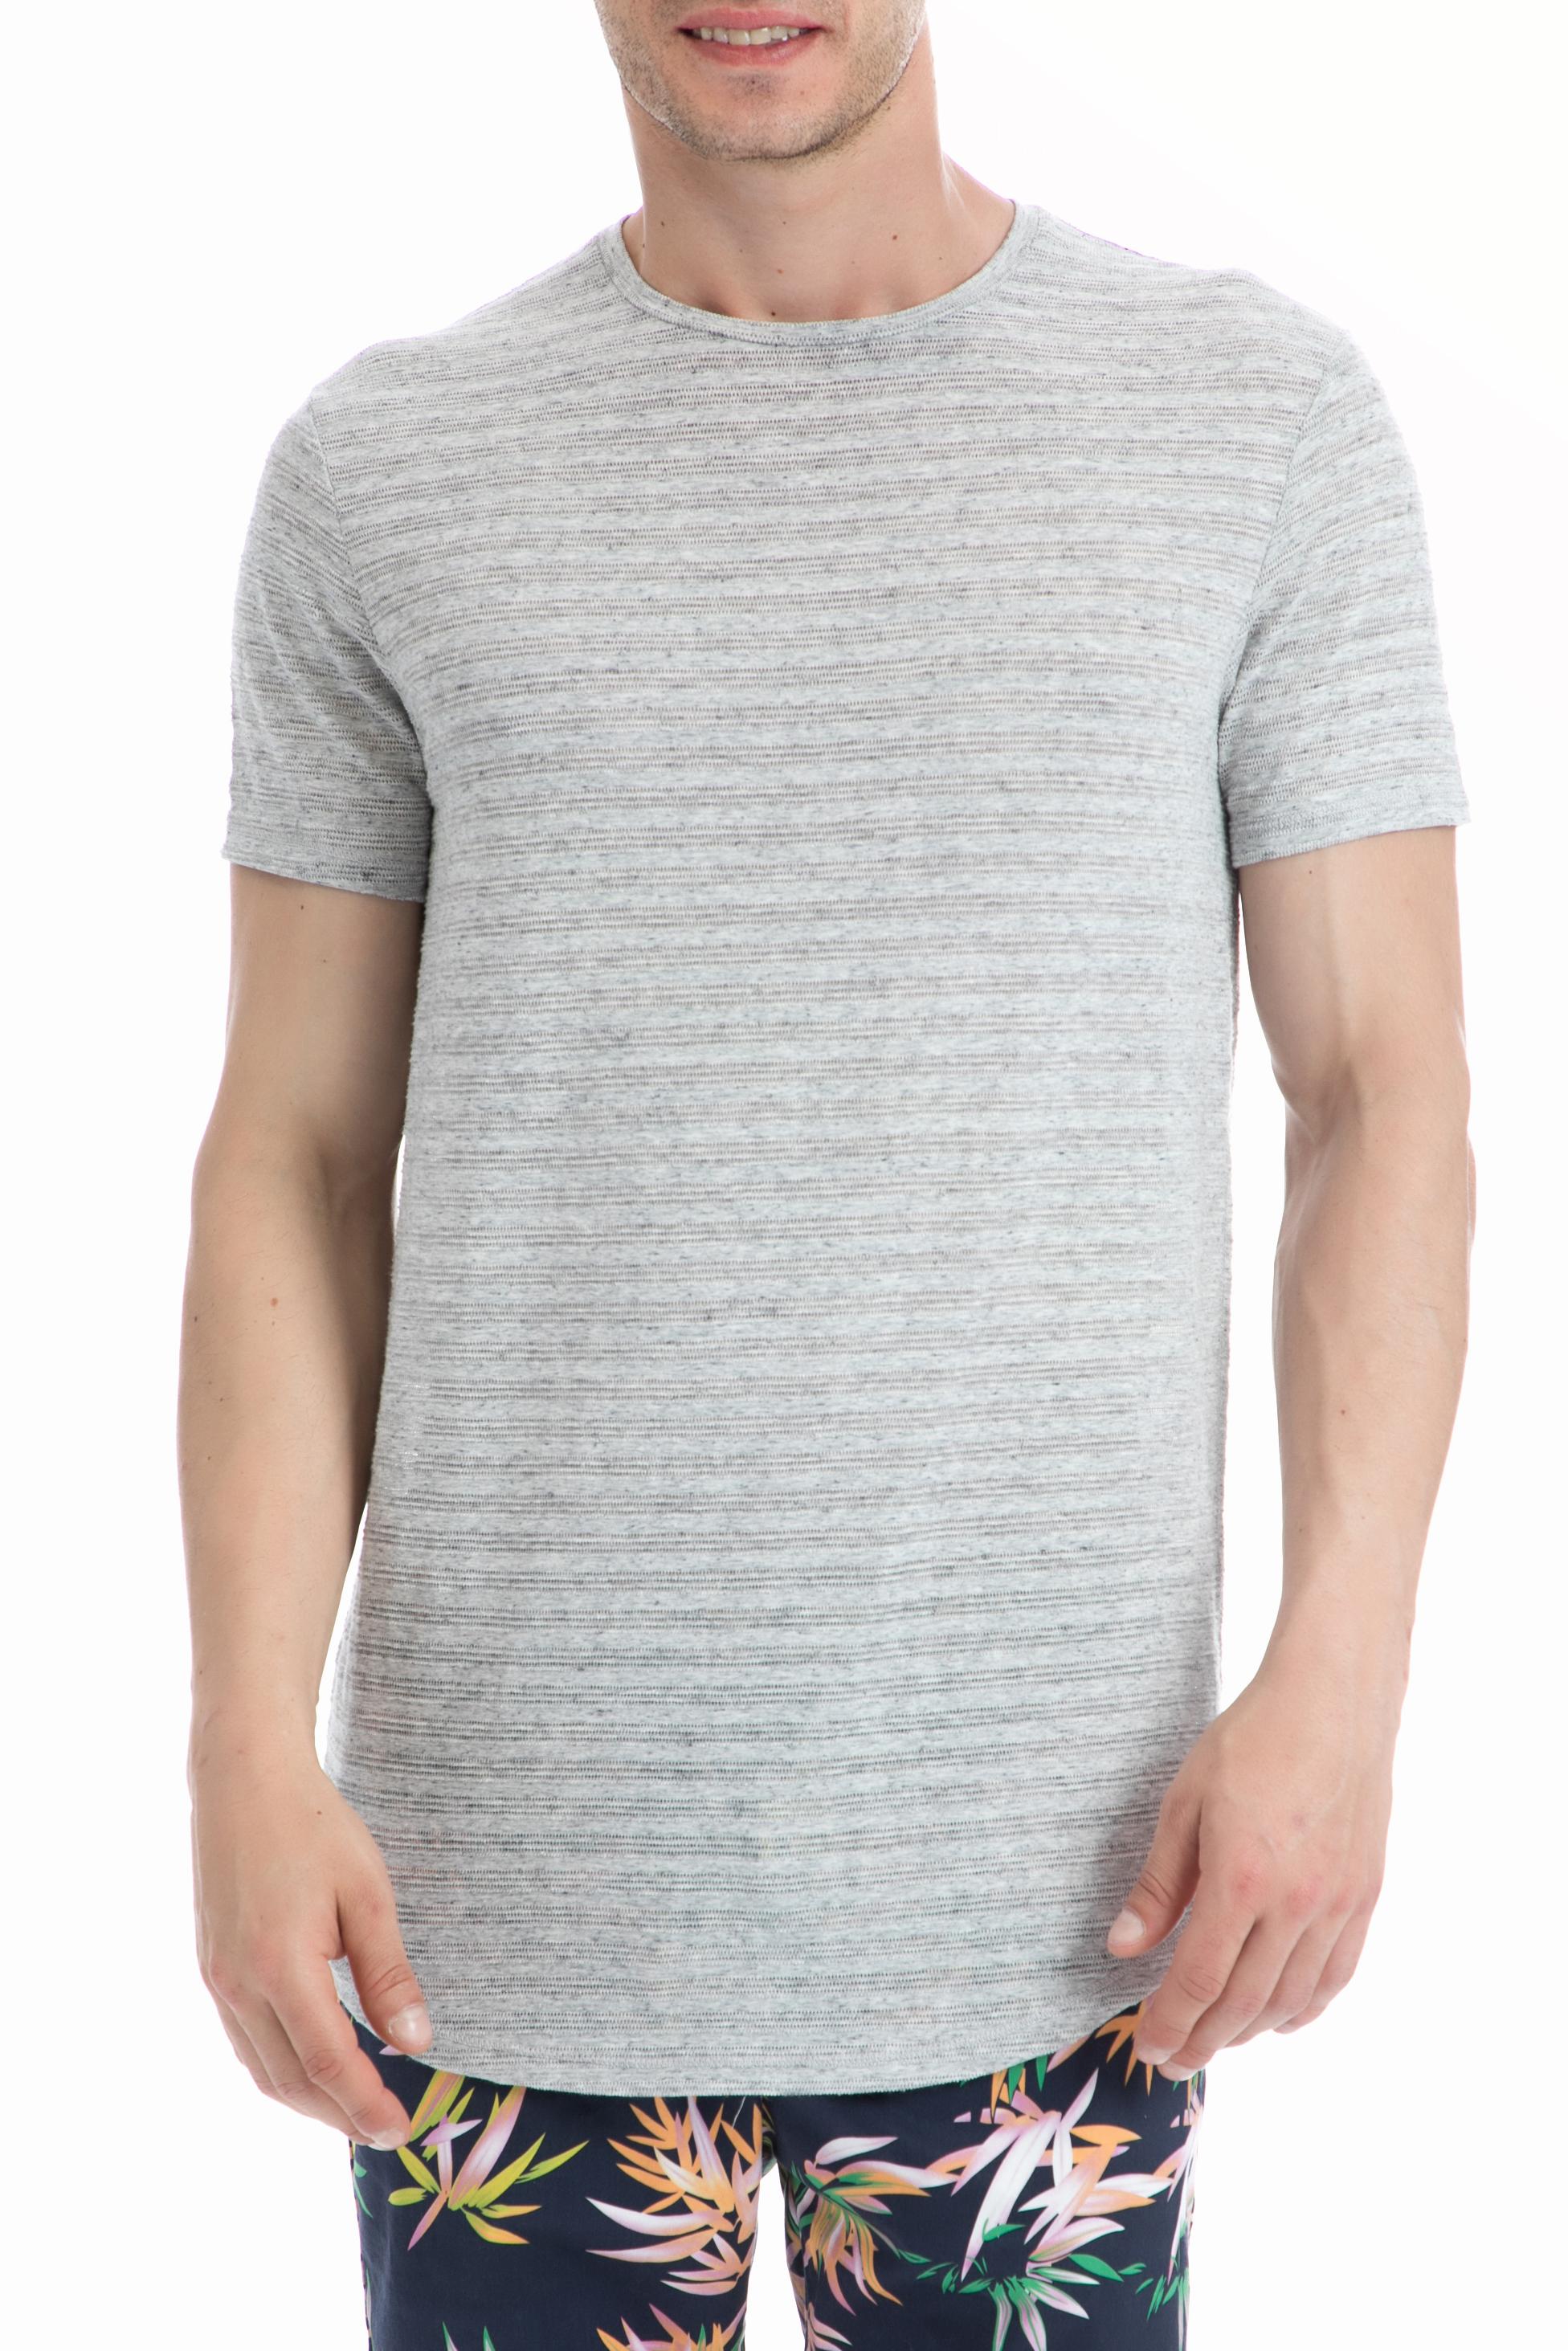 SCOTCH & SODA - Ανδρική μπλούζα SCOTCH & SODA γκρι-μπεζ ανδρικά ρούχα μπλούζες κοντομάνικες